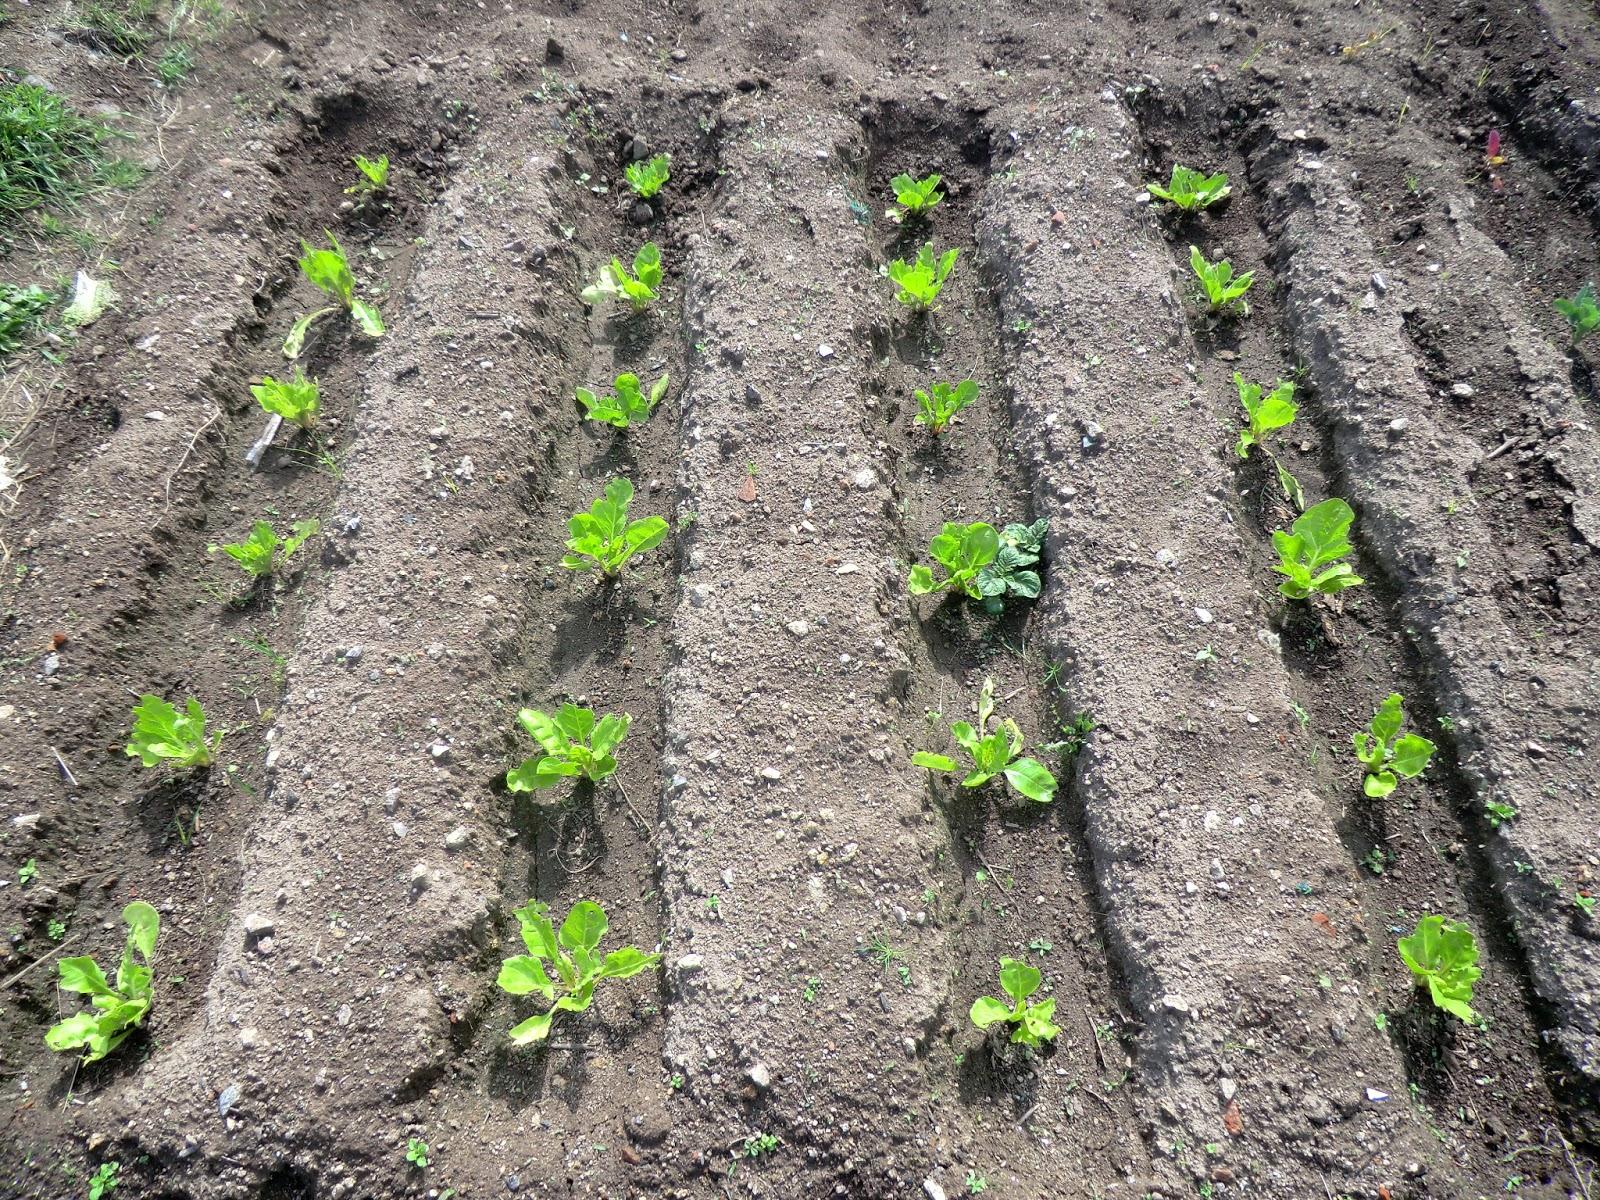 Con vistas al huerto for Como cultivar hortalizas